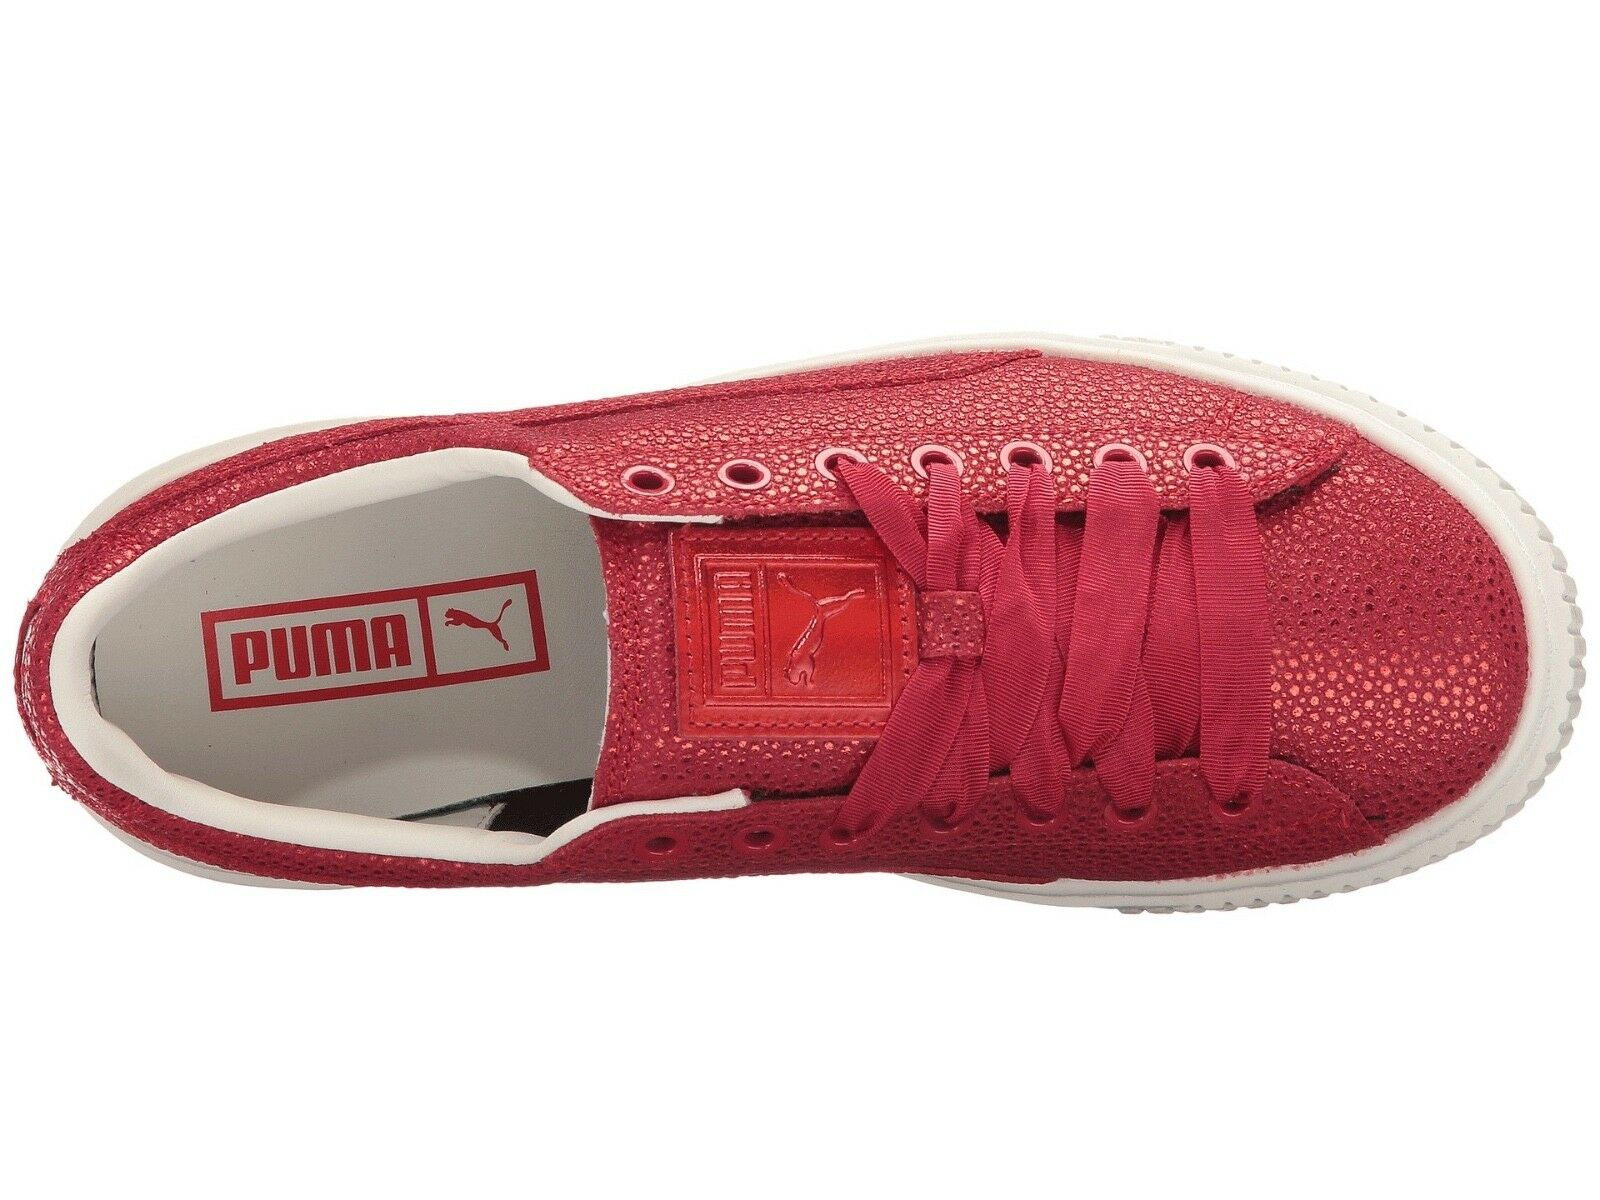 NEW Platform 120 Damenschuhe Puma Schuhes Platform NEW Lux Sneakers in Toreador Metallic ROT sz 8 e45a6e